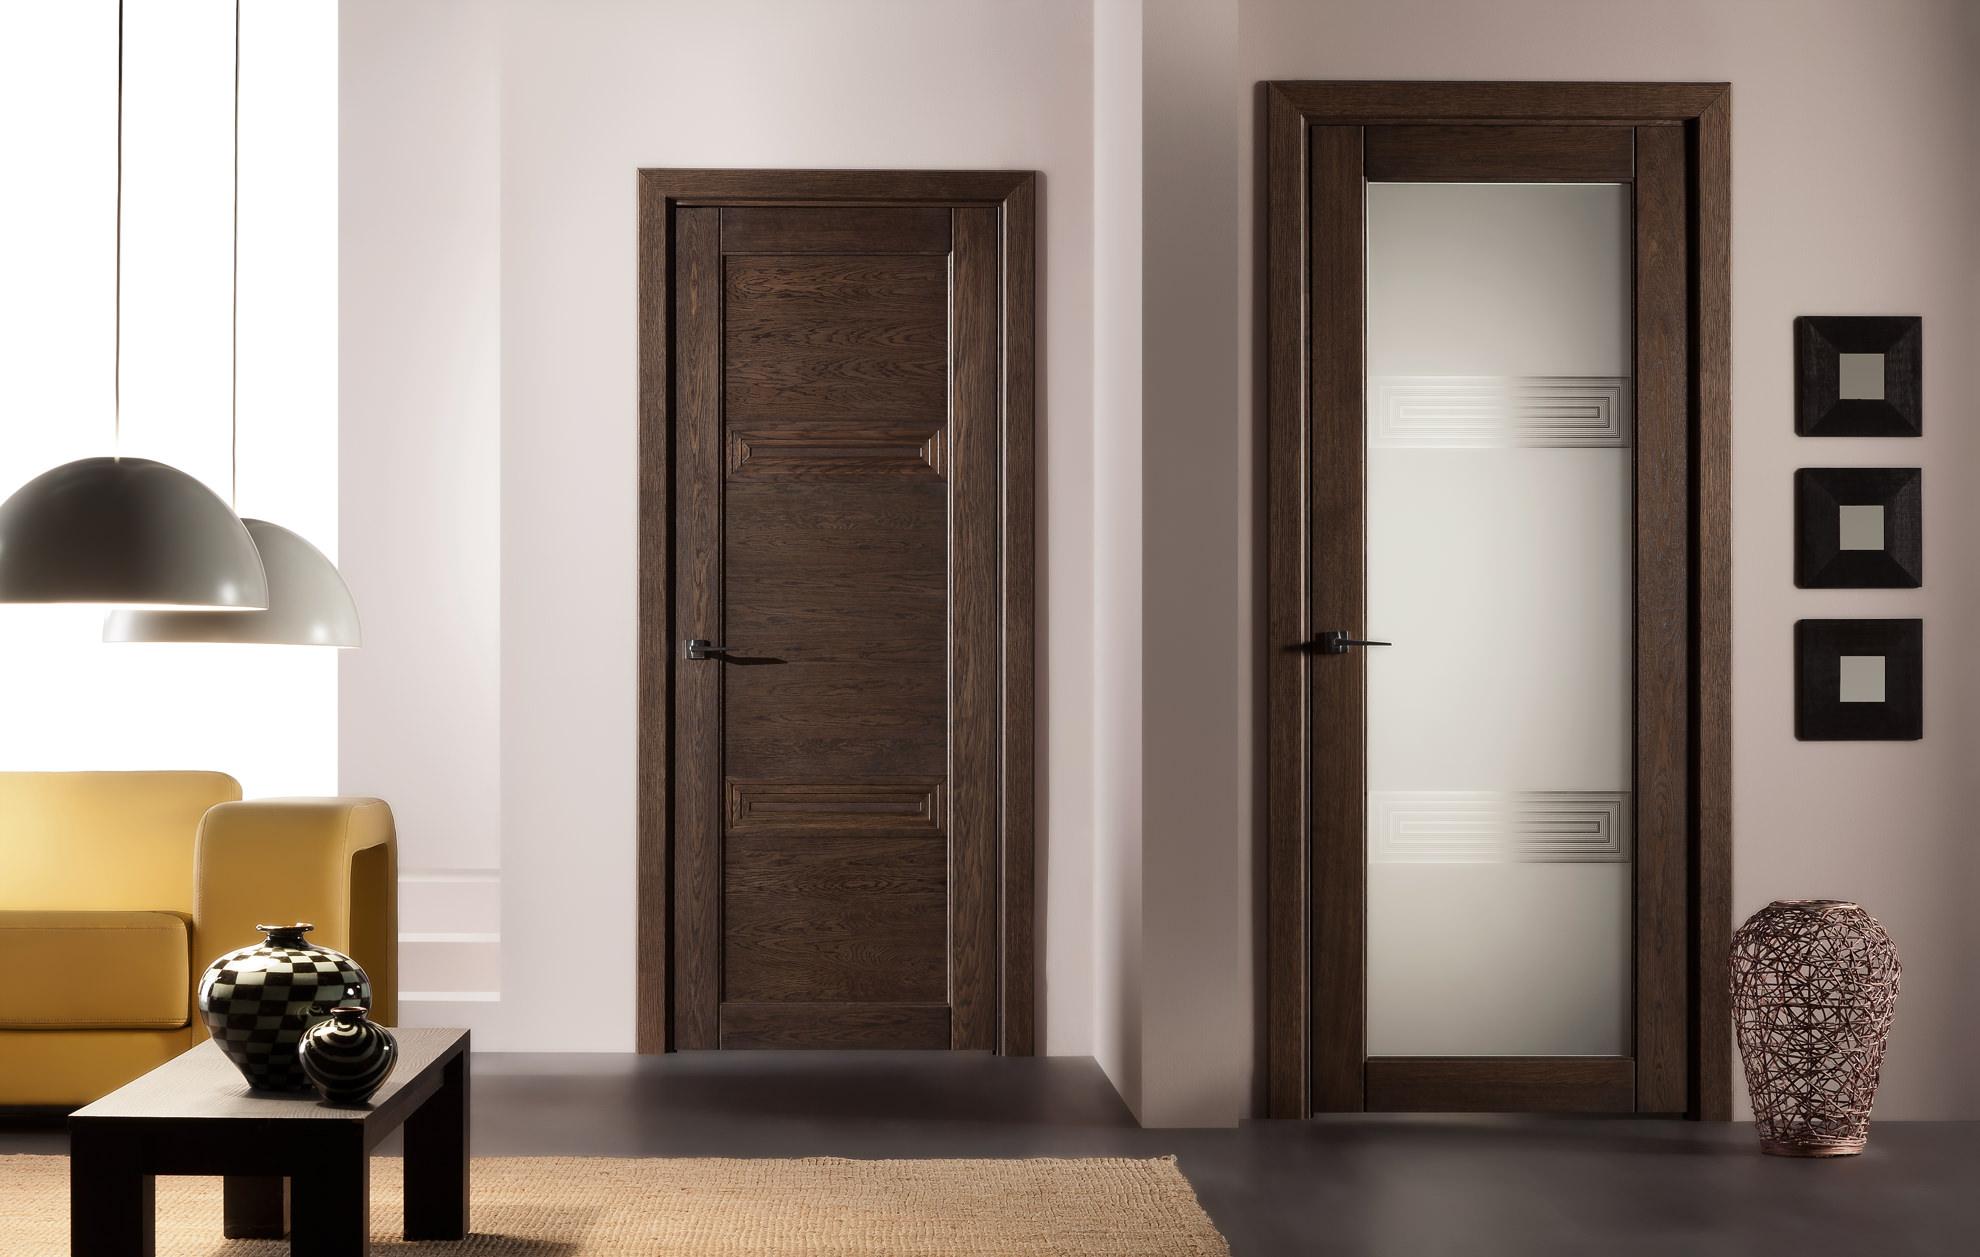 Fiberglass Doors Lowes   Reliabilt Doors Review   Lowes Doors on SaleInterior   Decor  Reliabilt Doors Review For Your Home Door  . Lowes Exterior Doors Sale. Home Design Ideas